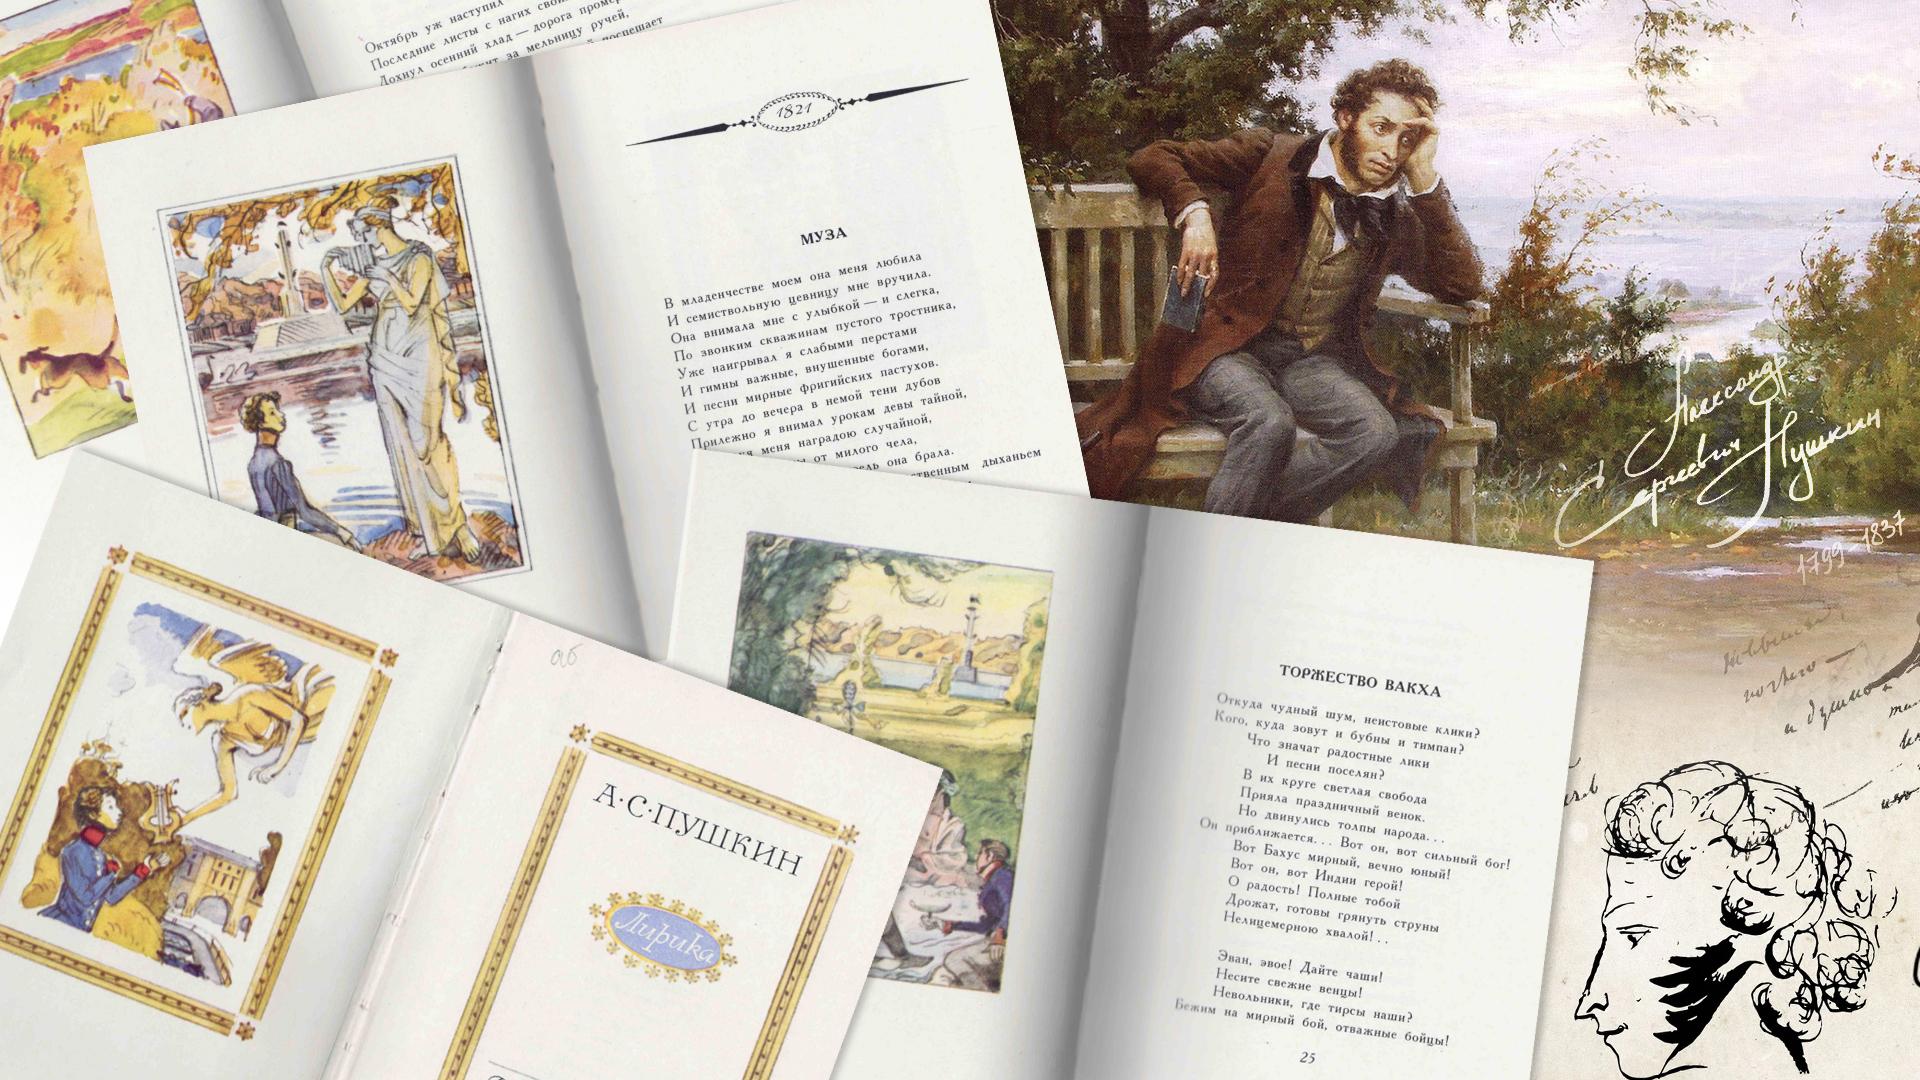 Гадание по стихам Пушкина